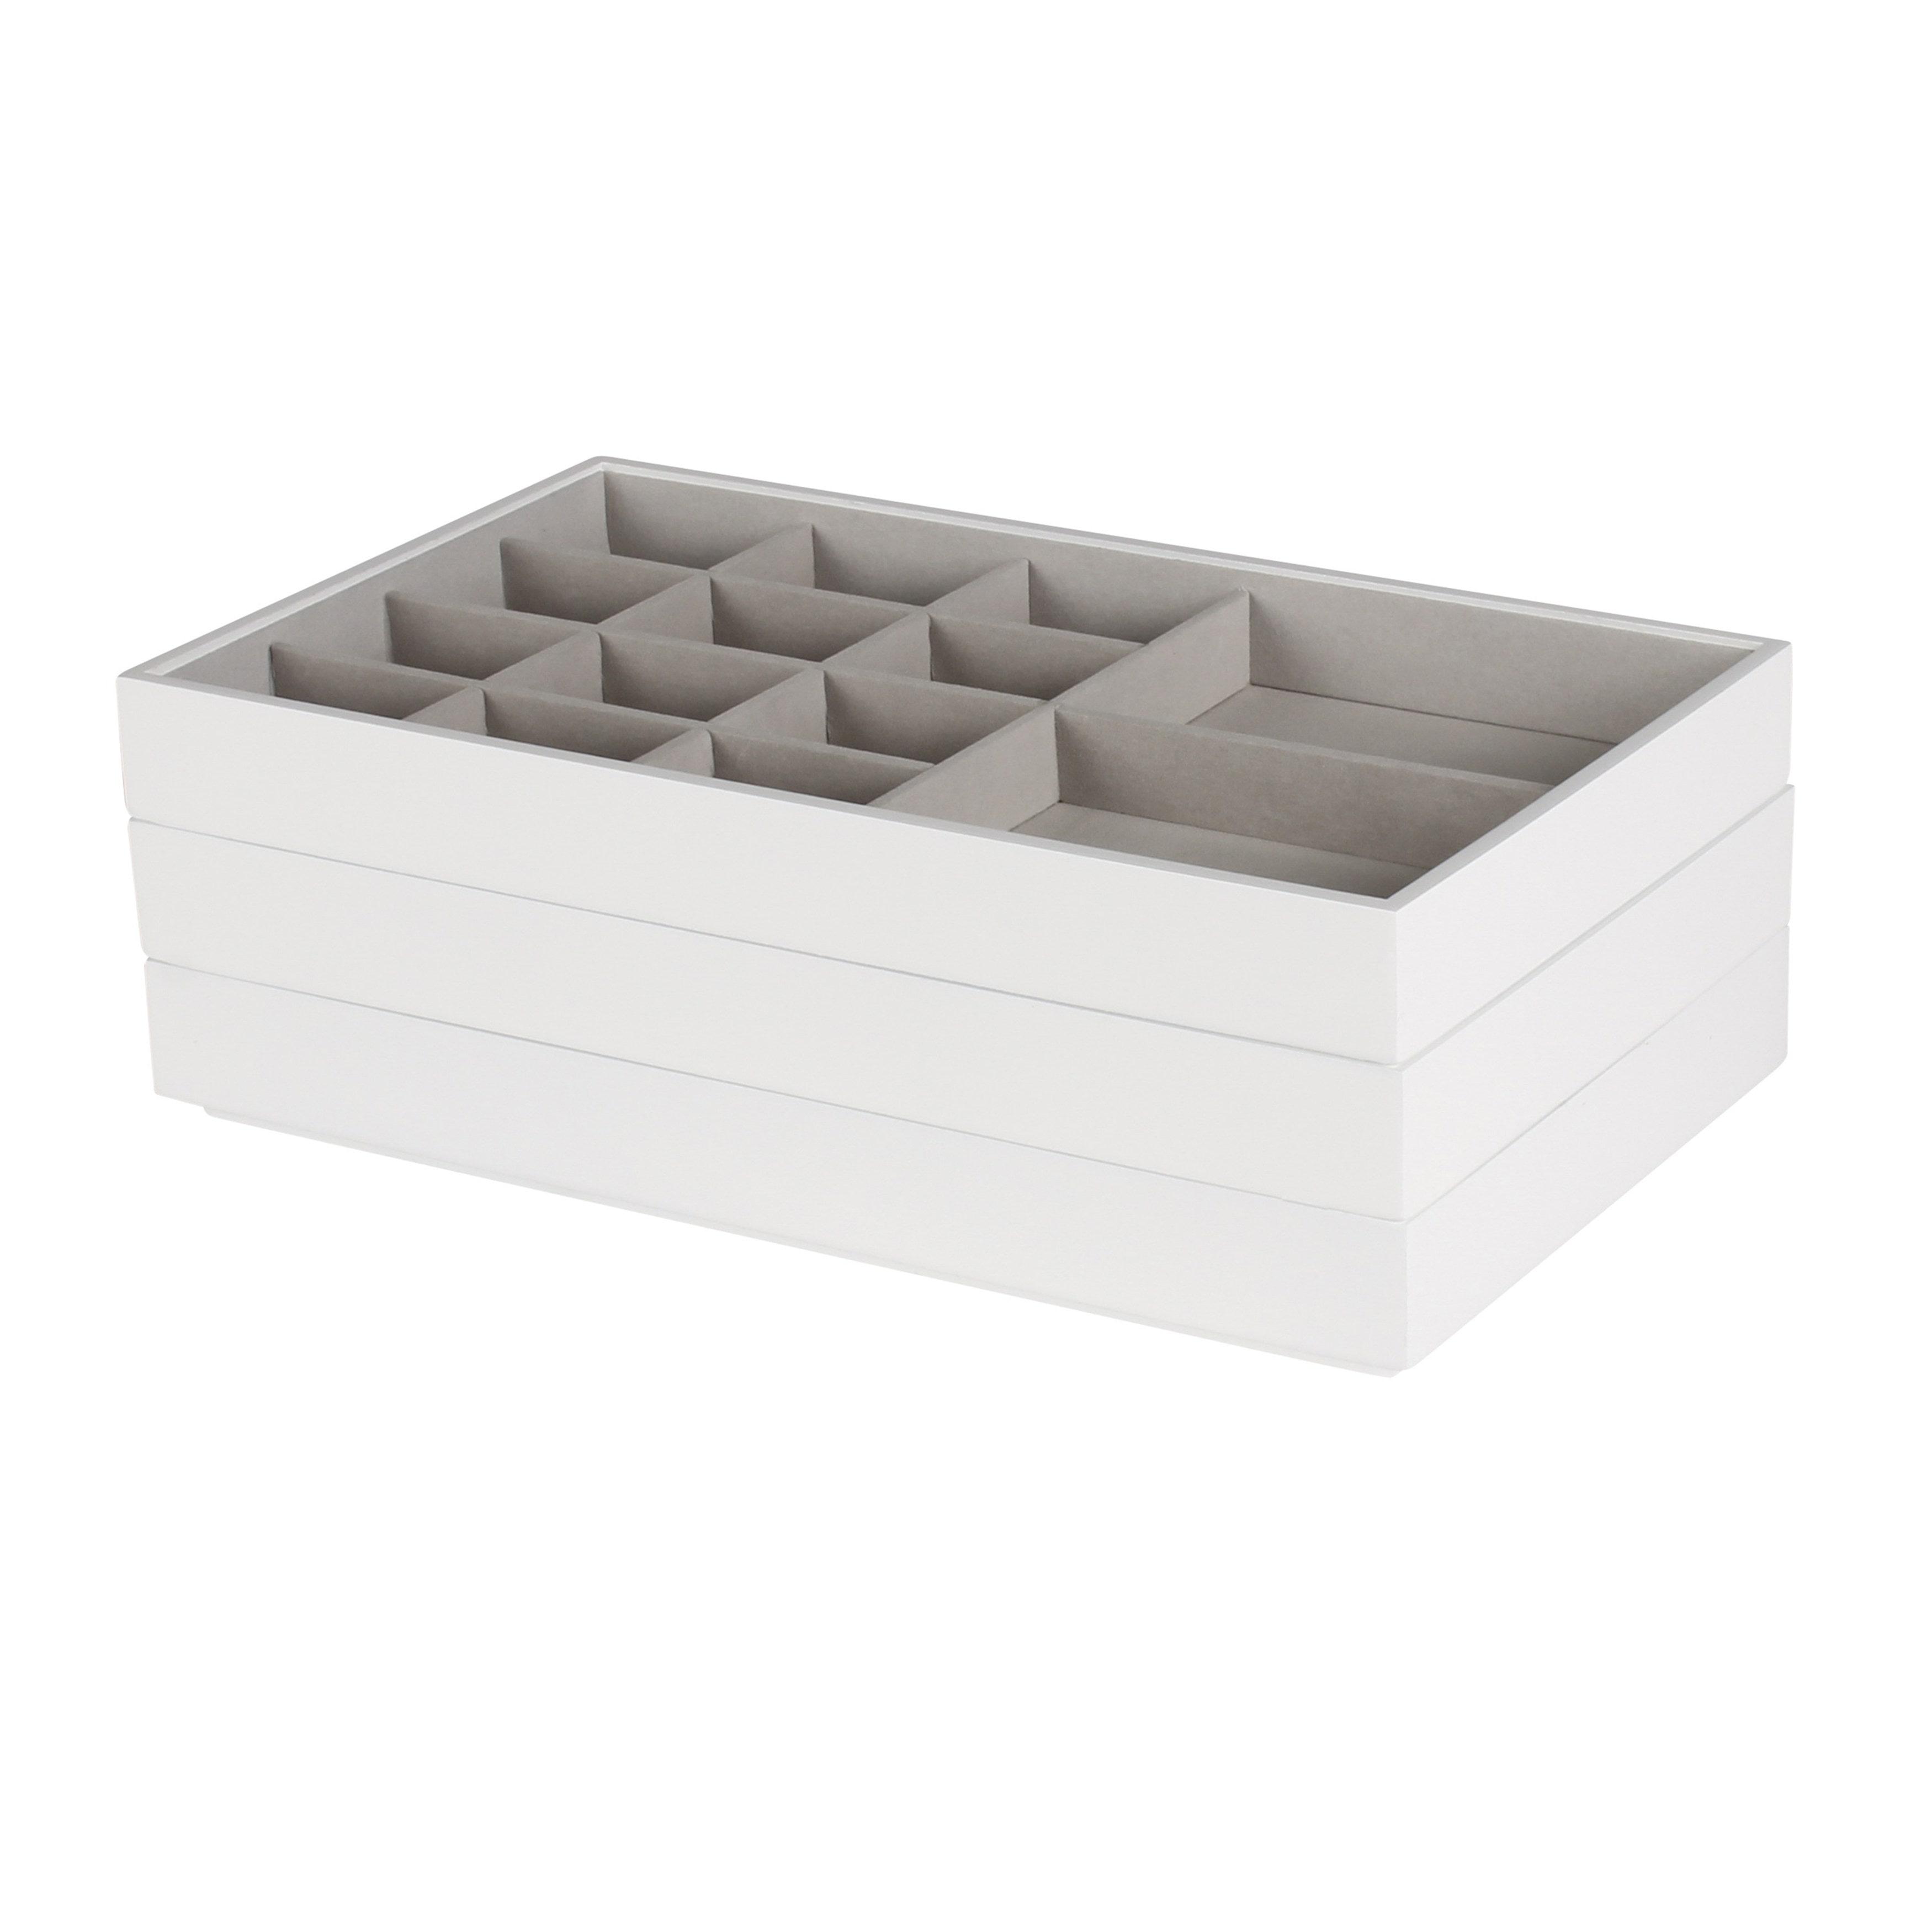 Vanity Organizer / White Myrcella Jewelry Storage Stackable Trays, Set of 3 0